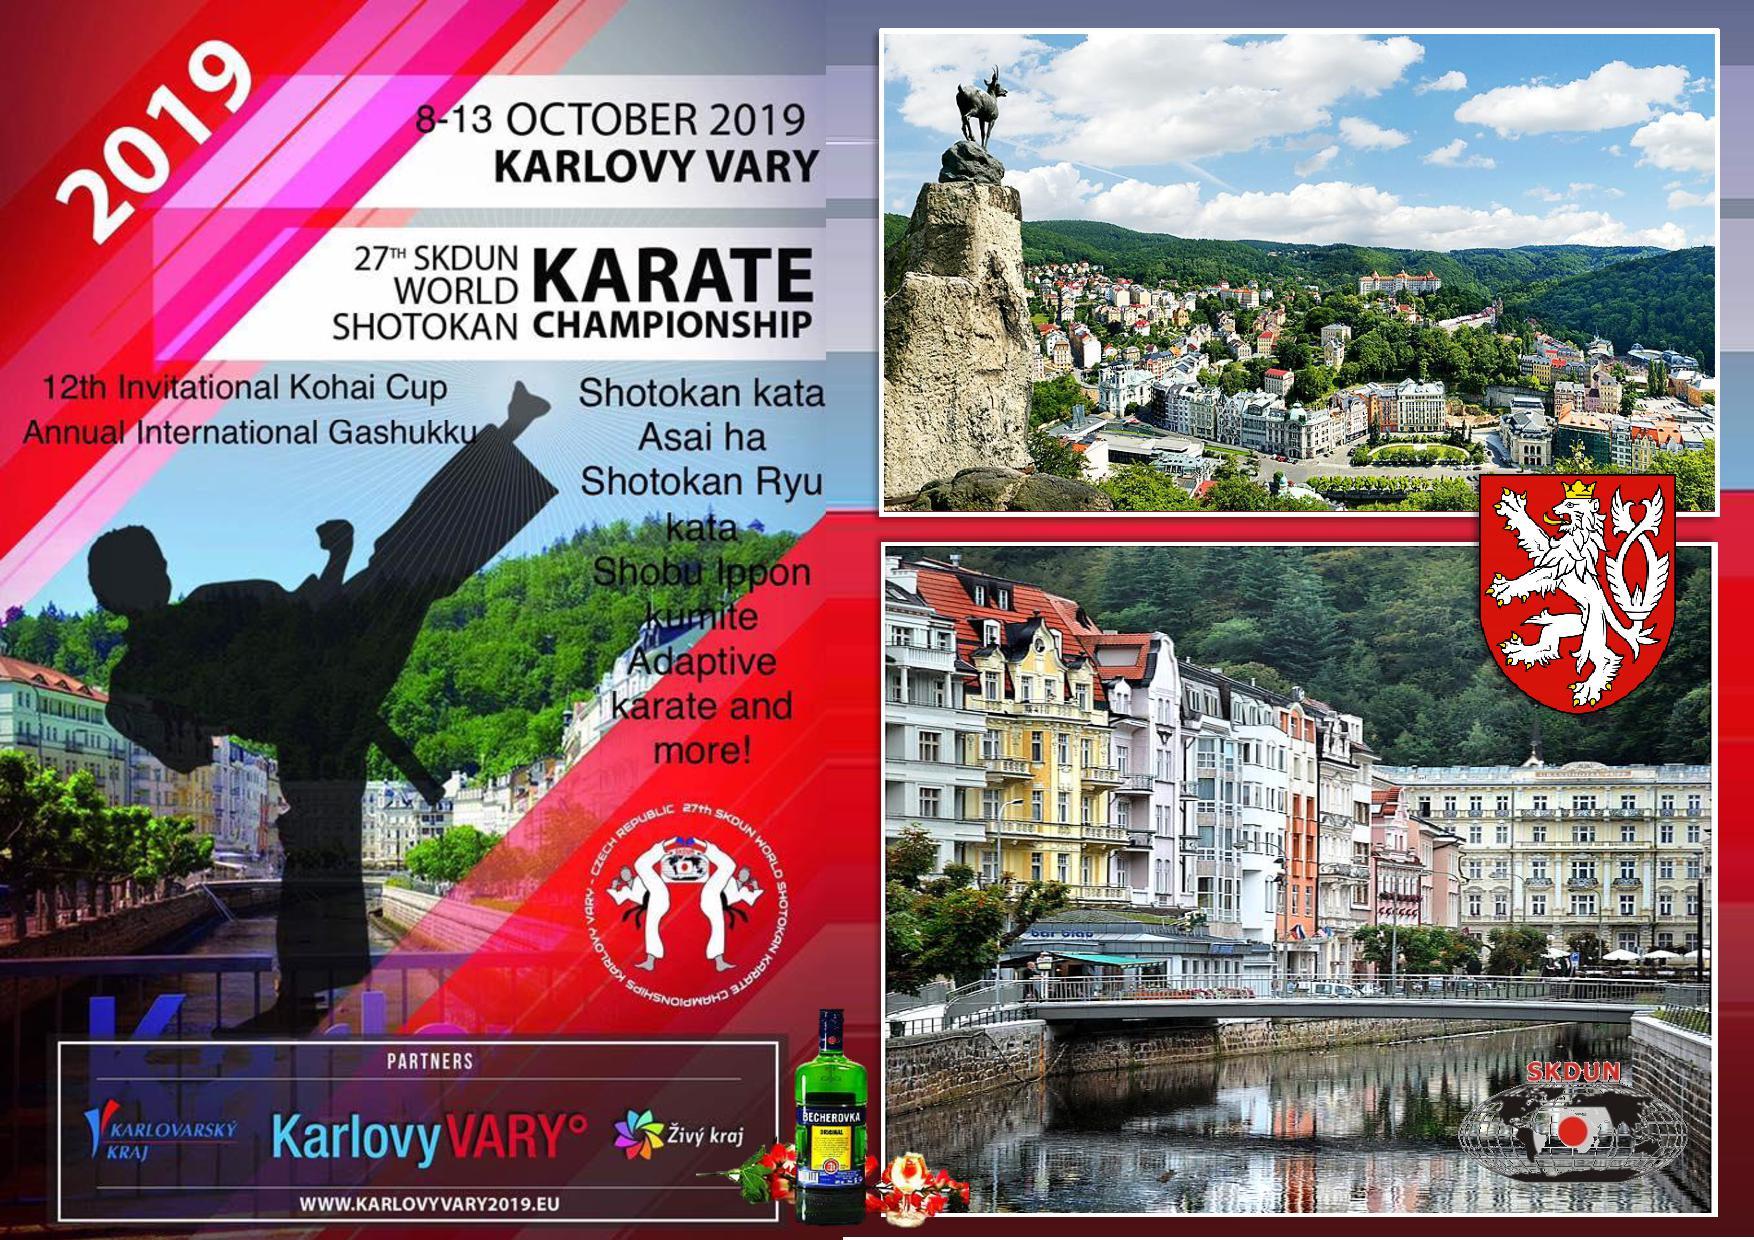 10-14 октября 2019 года, Карловы Вары, Чехия